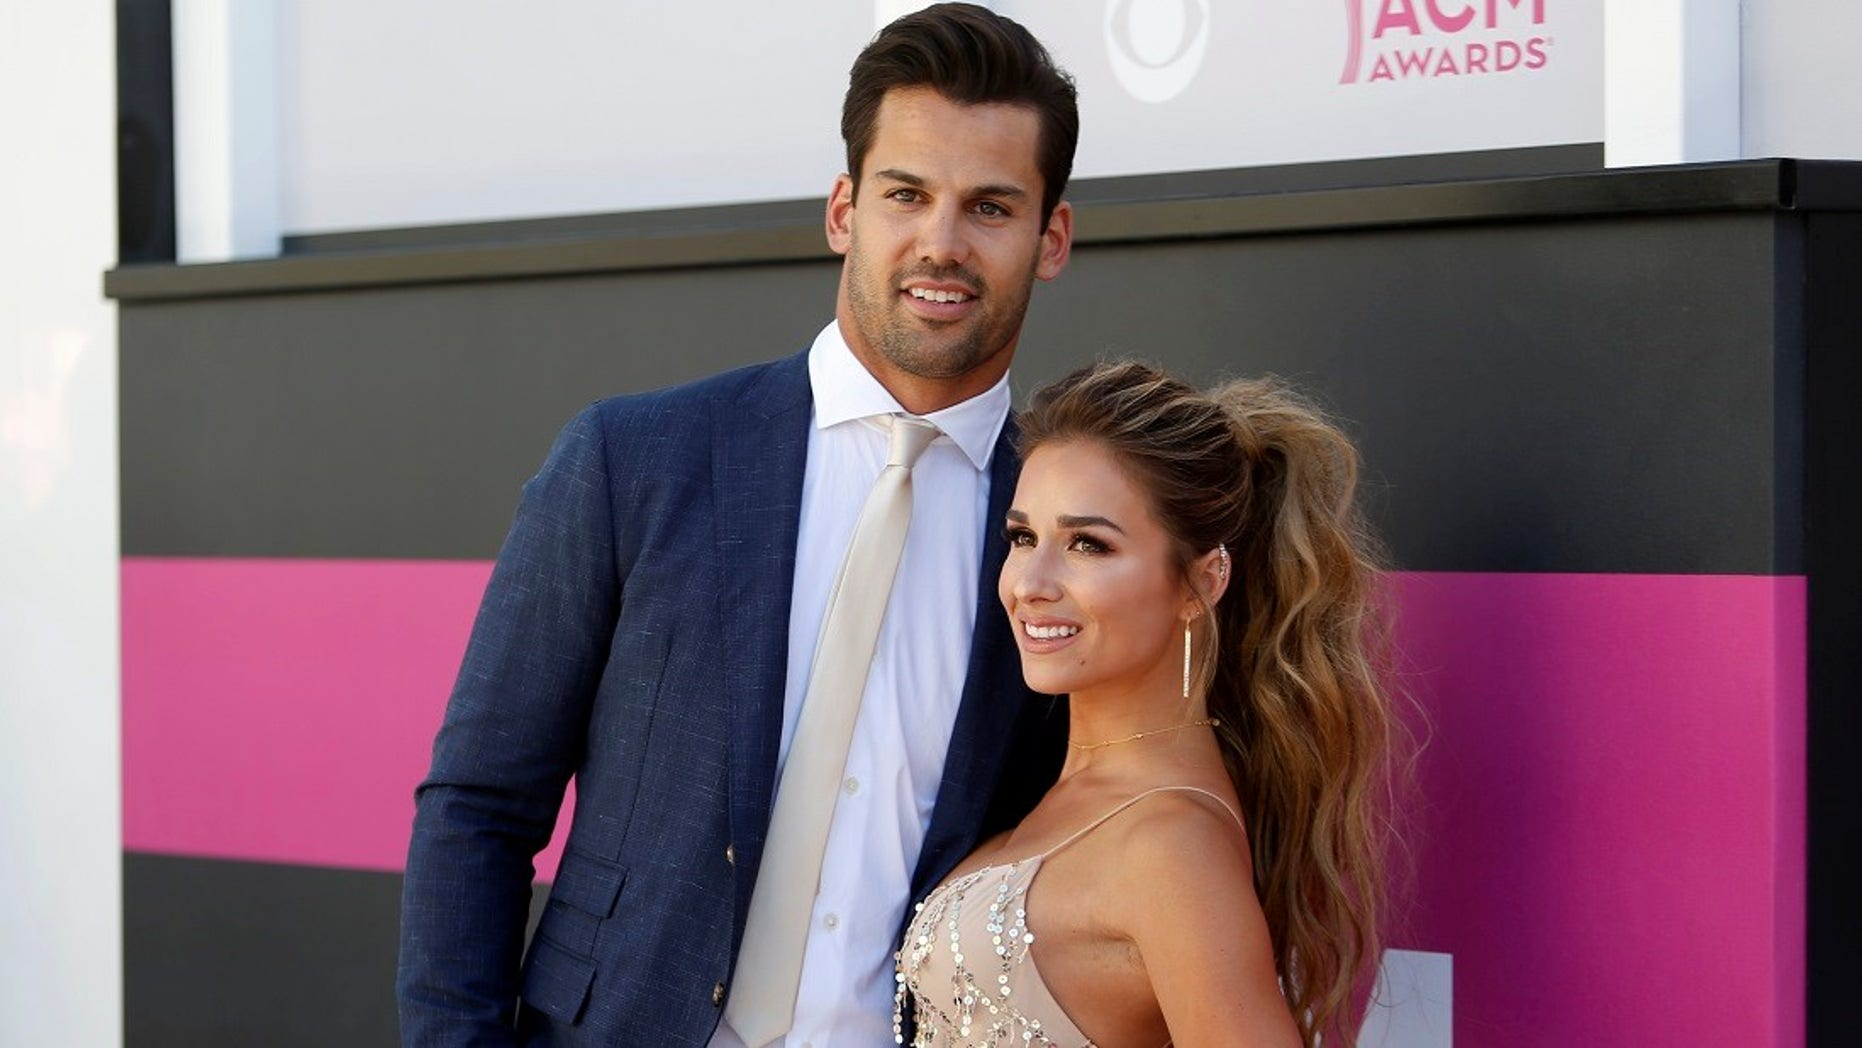 Football player Eric Decker and his wife, singer Jessie James Decker.